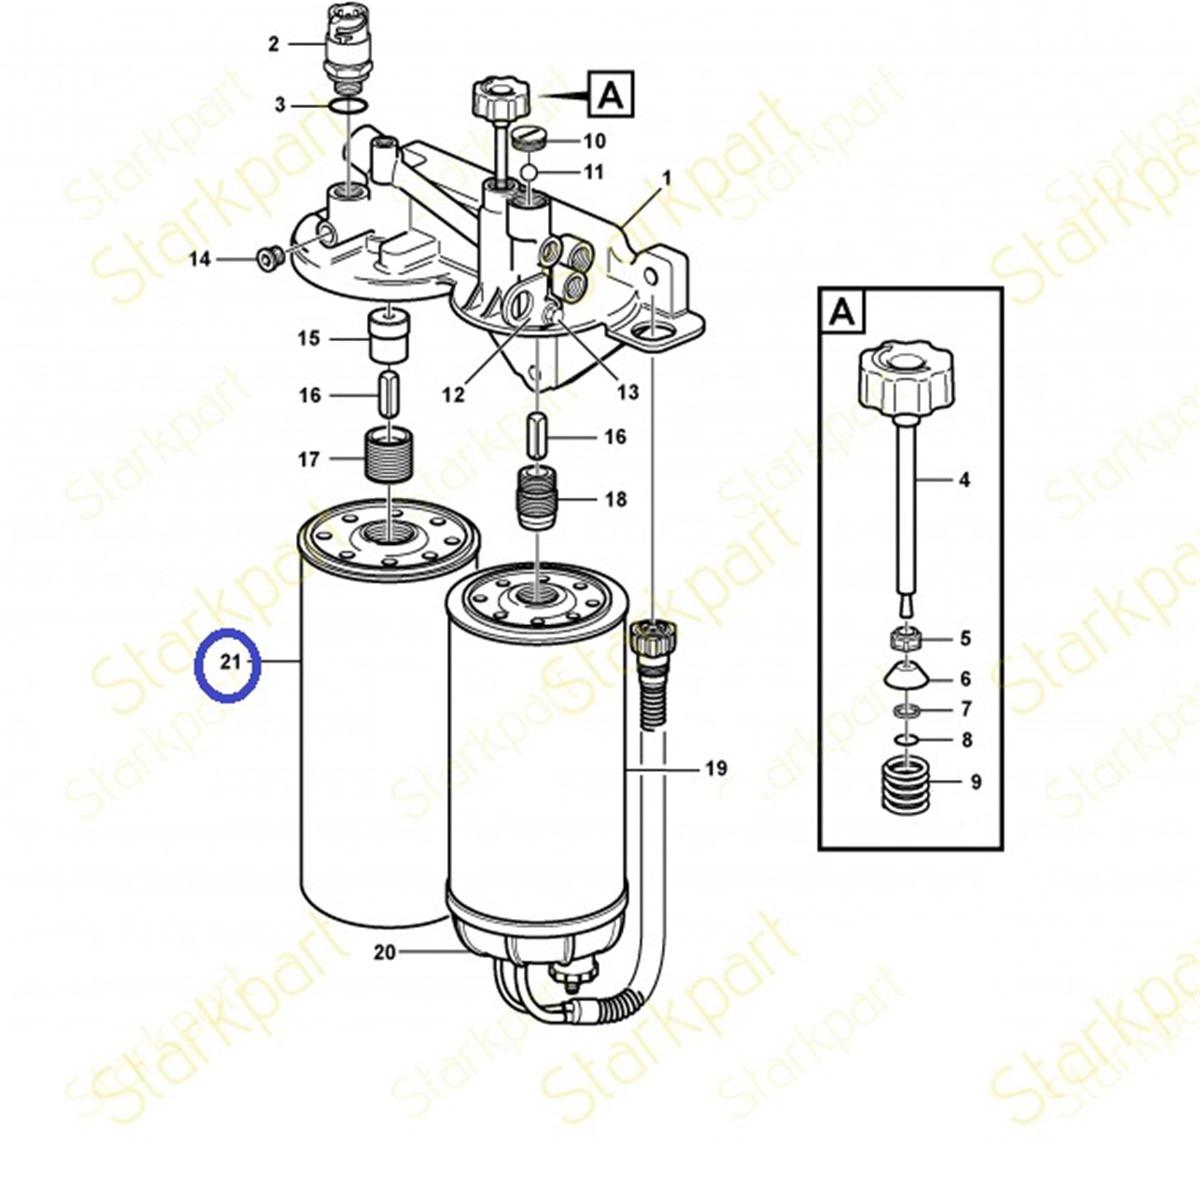 hight resolution of mack mp8 engine fuel system diagrams cummins isx fuel volvo truck radio wiring diagram volvo truck